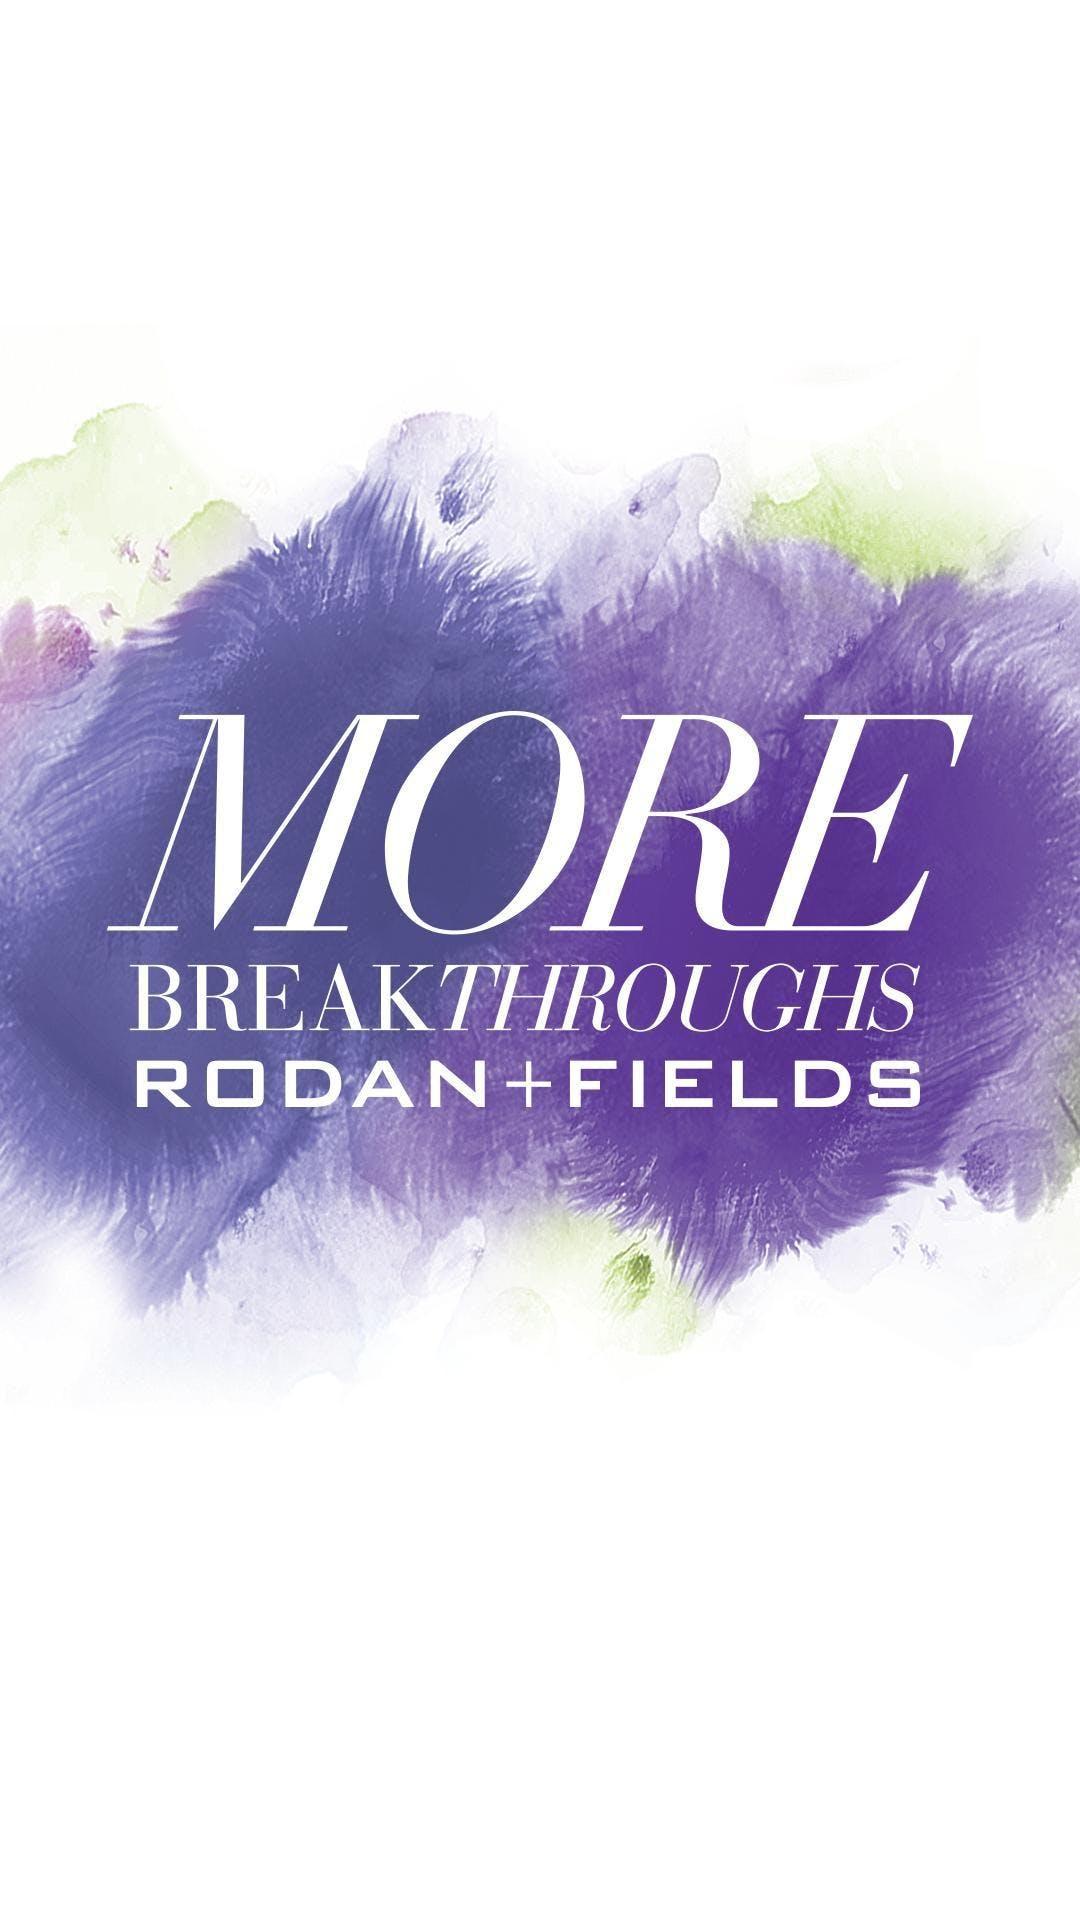 Rodan + Fields Breakthrough Event Phoenix